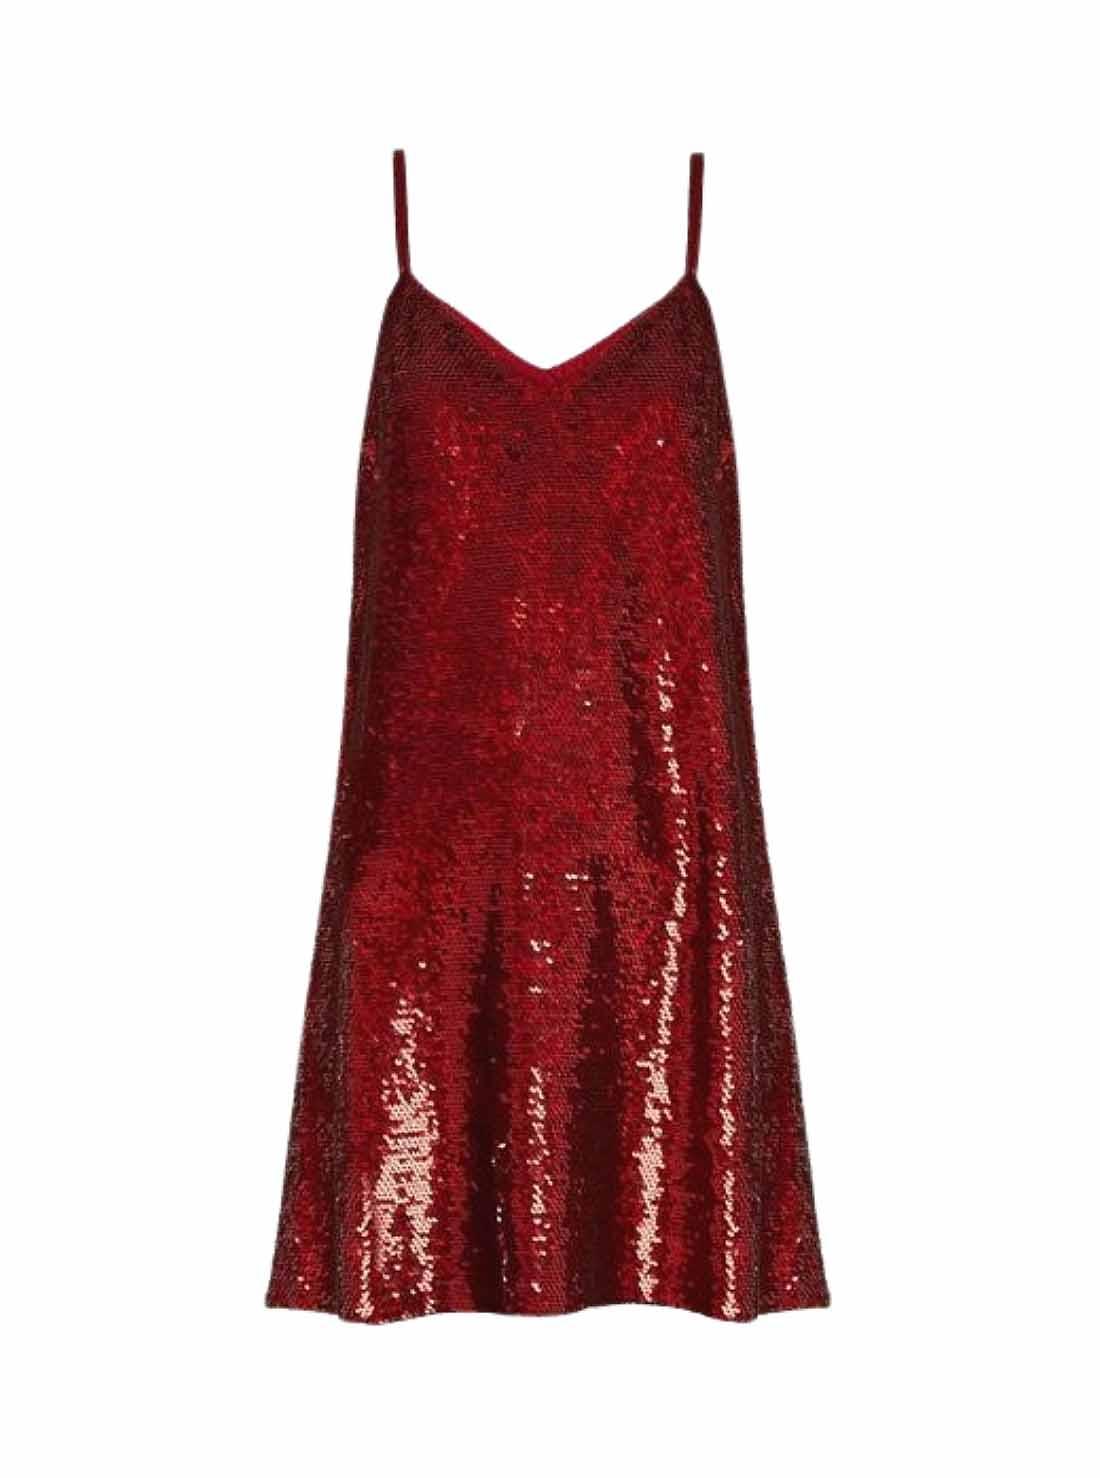 Strip A-Line Red Sequins Dress